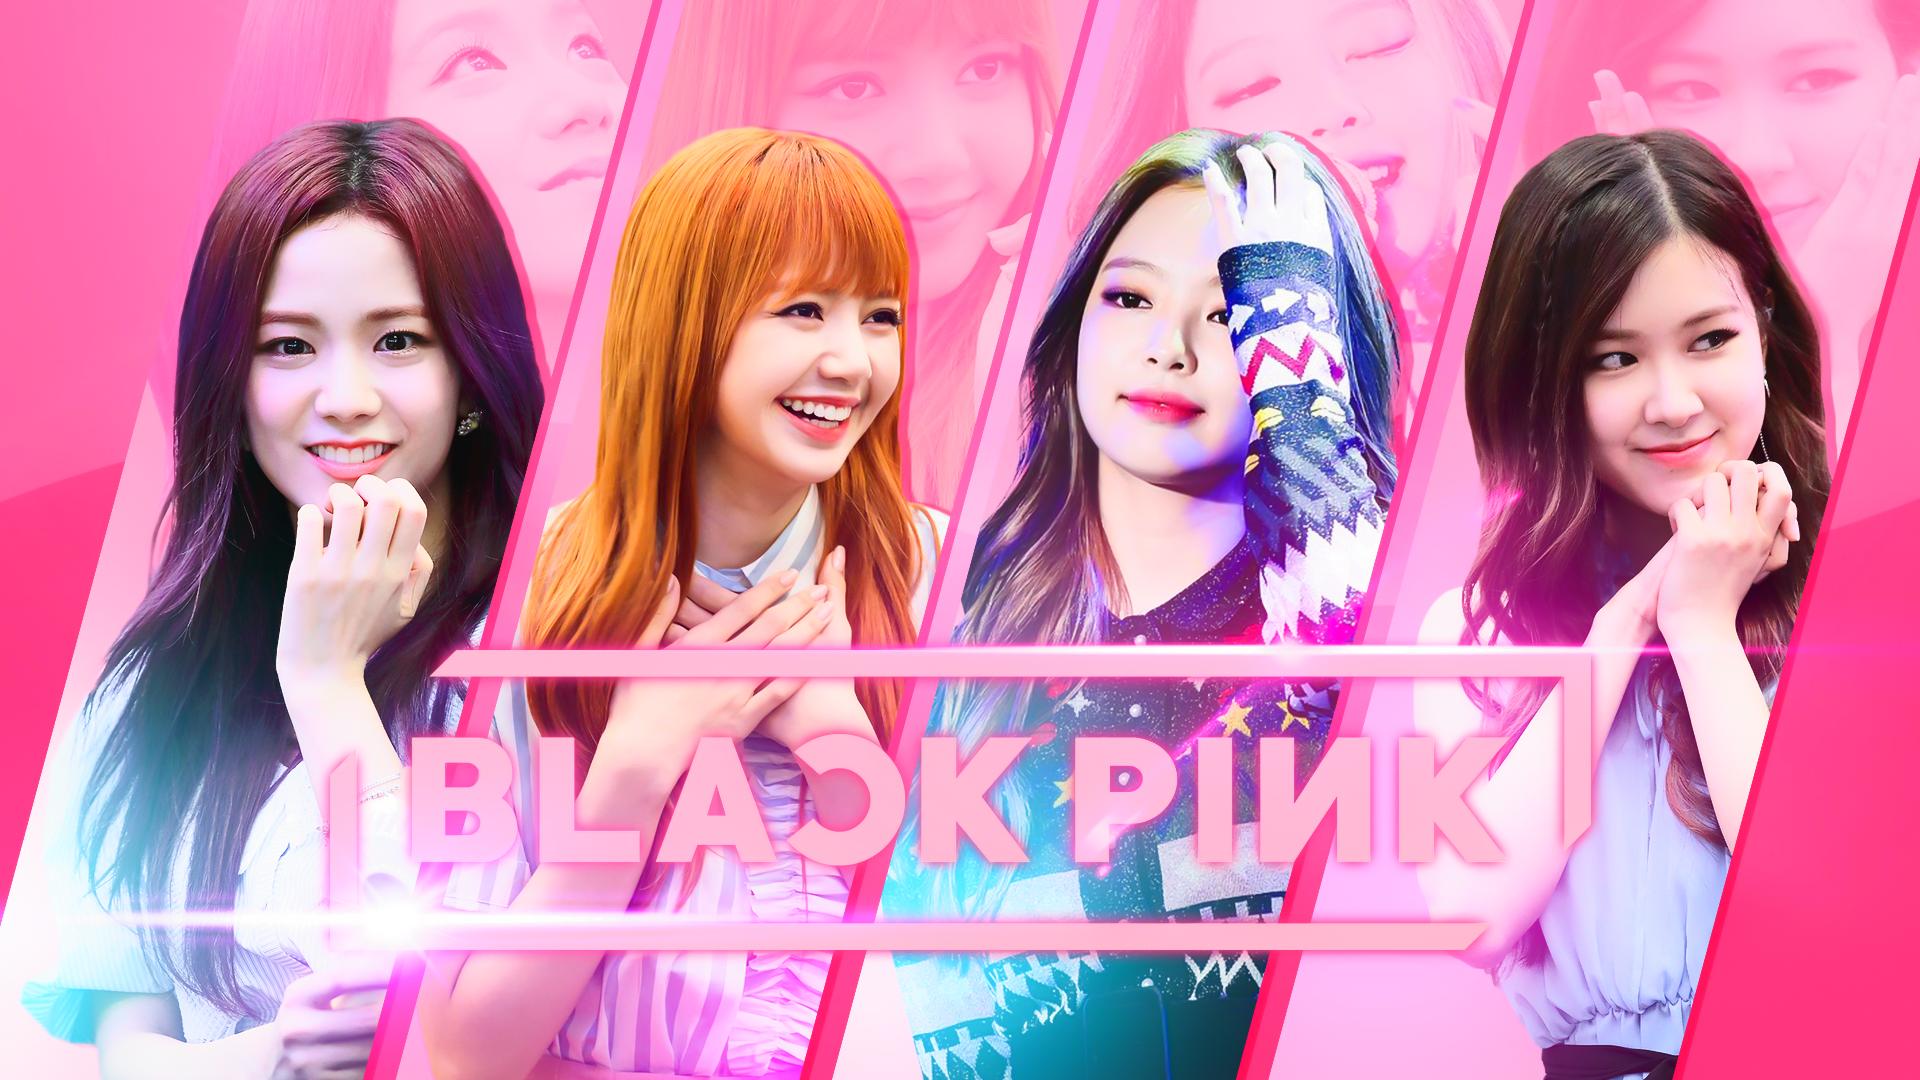 Blackpink Wallpaper Jennie Rose Jisoo Lisa By Ohshititzavin On Deviantart